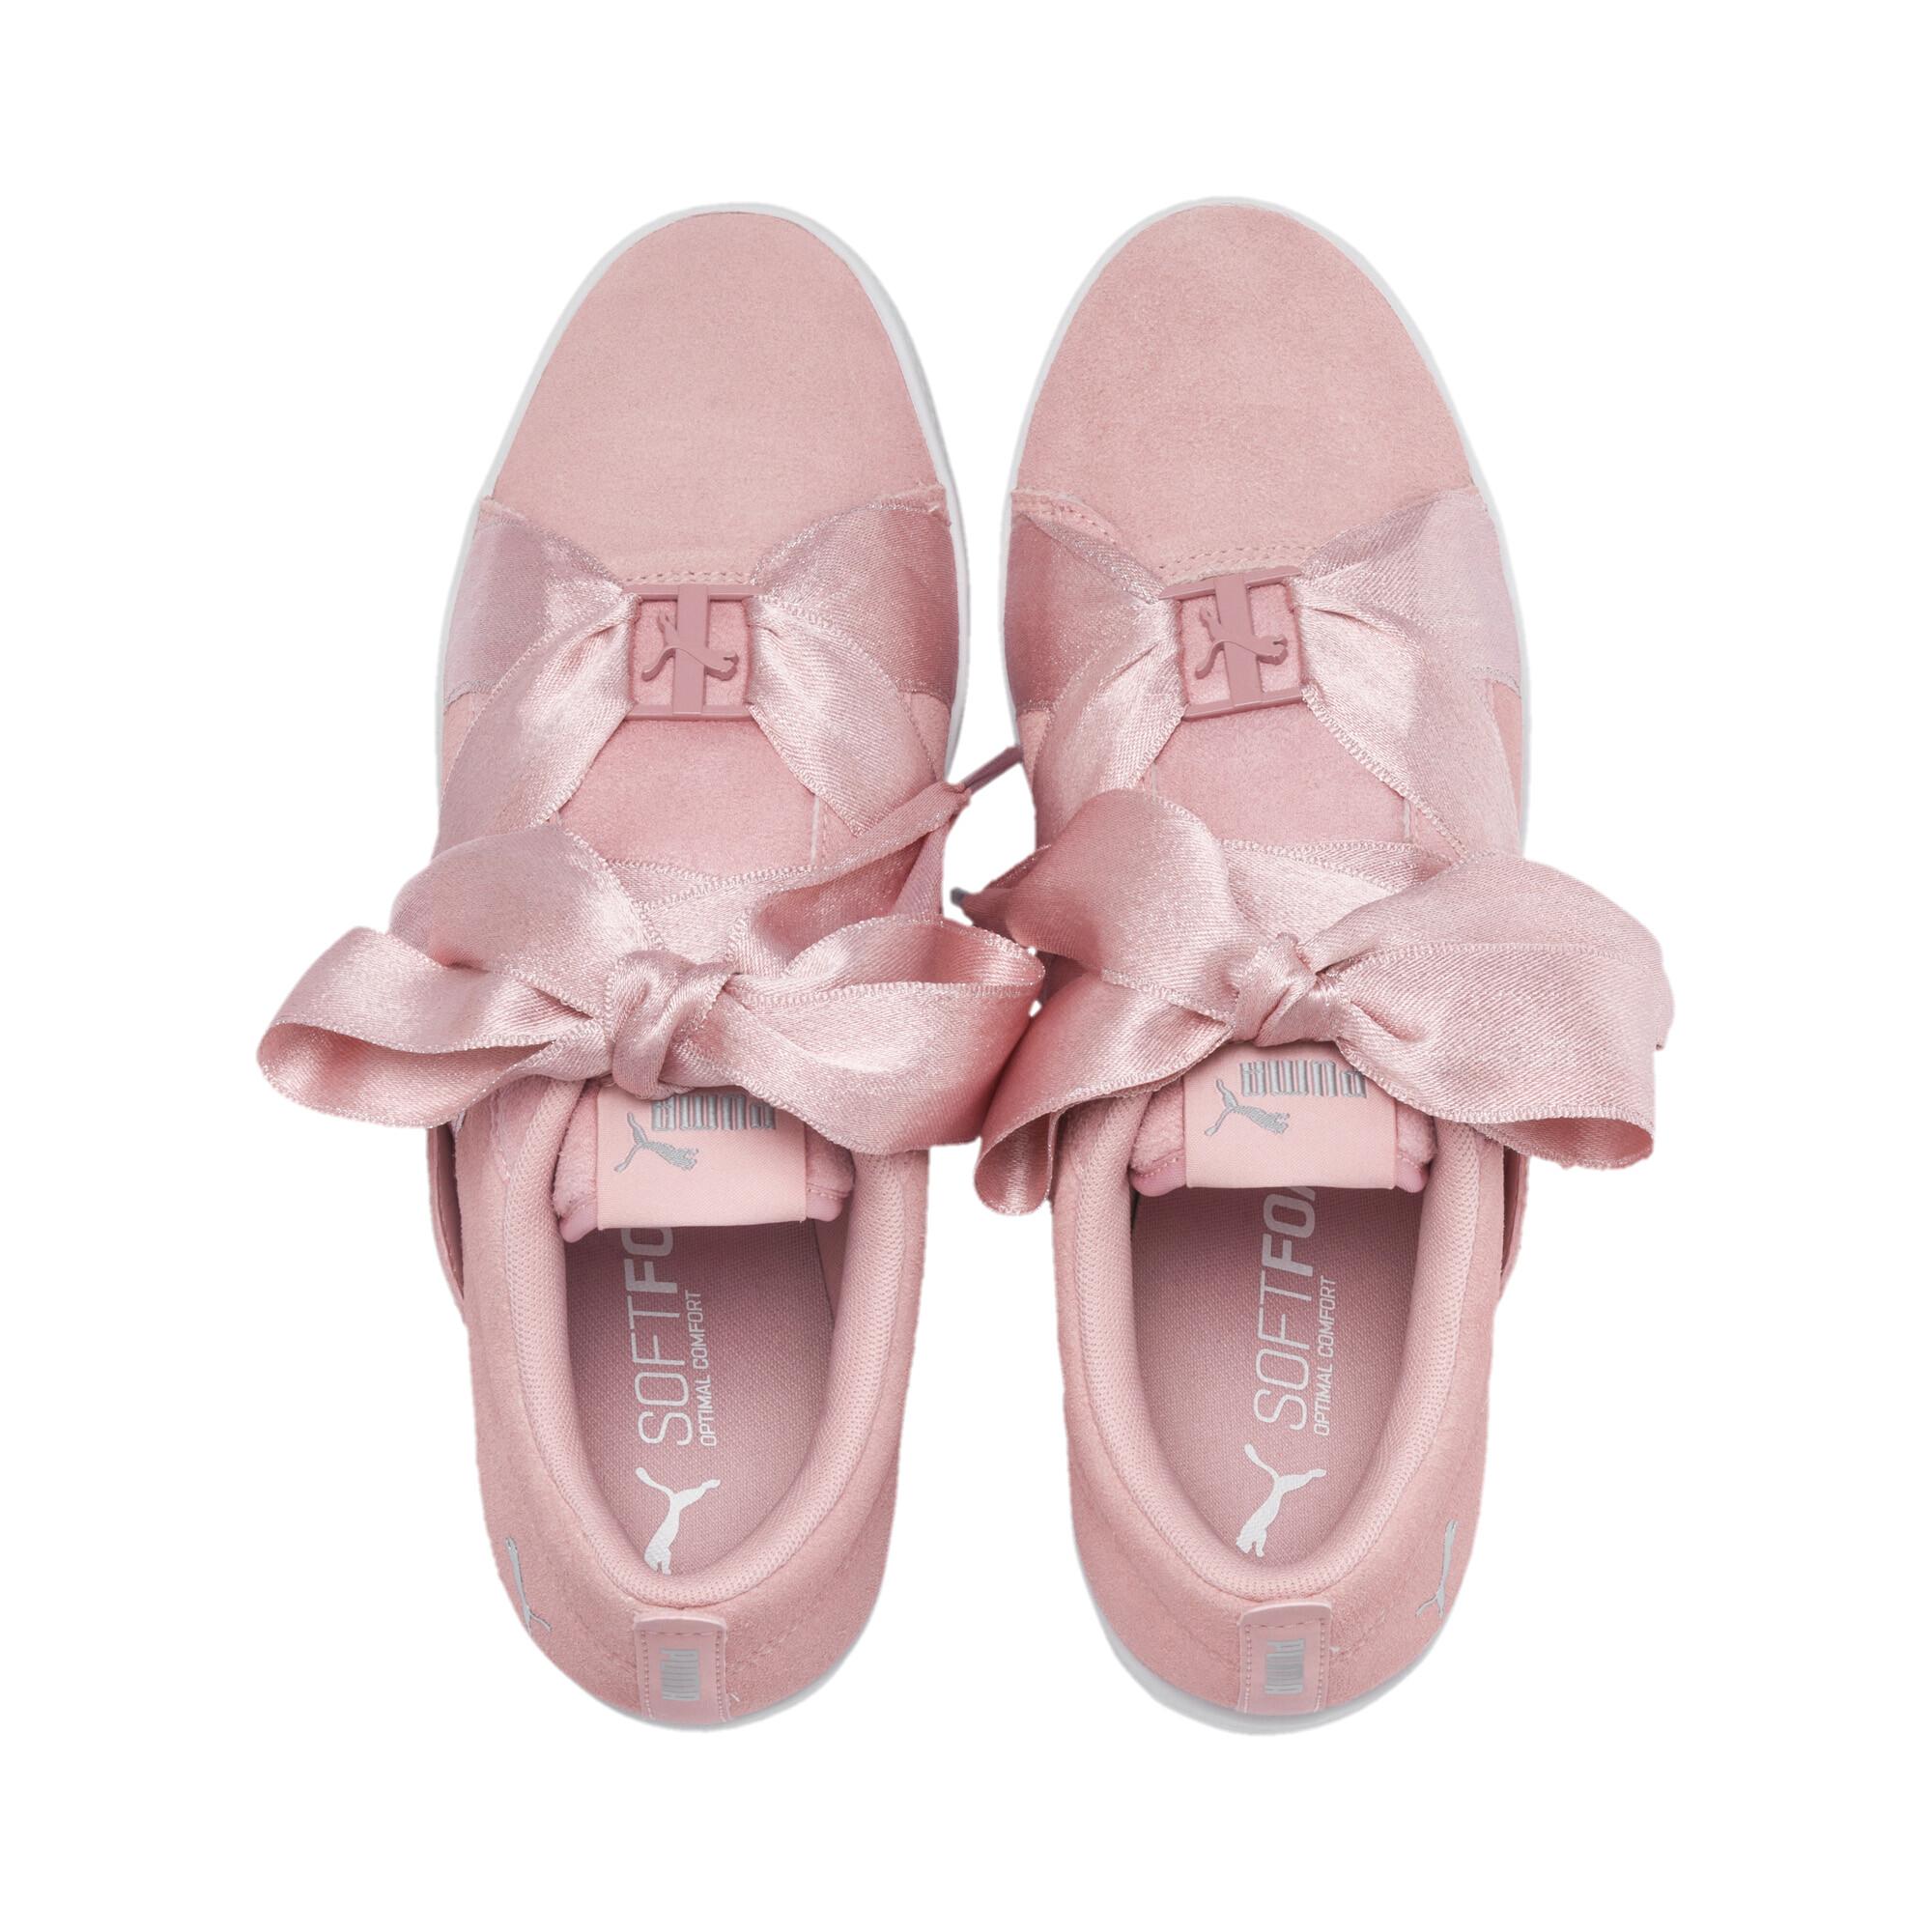 PUMA-PUMA-Smash-Astral-Buckle-Women-s-Sneakers-Women-Shoe-Basics thumbnail 8